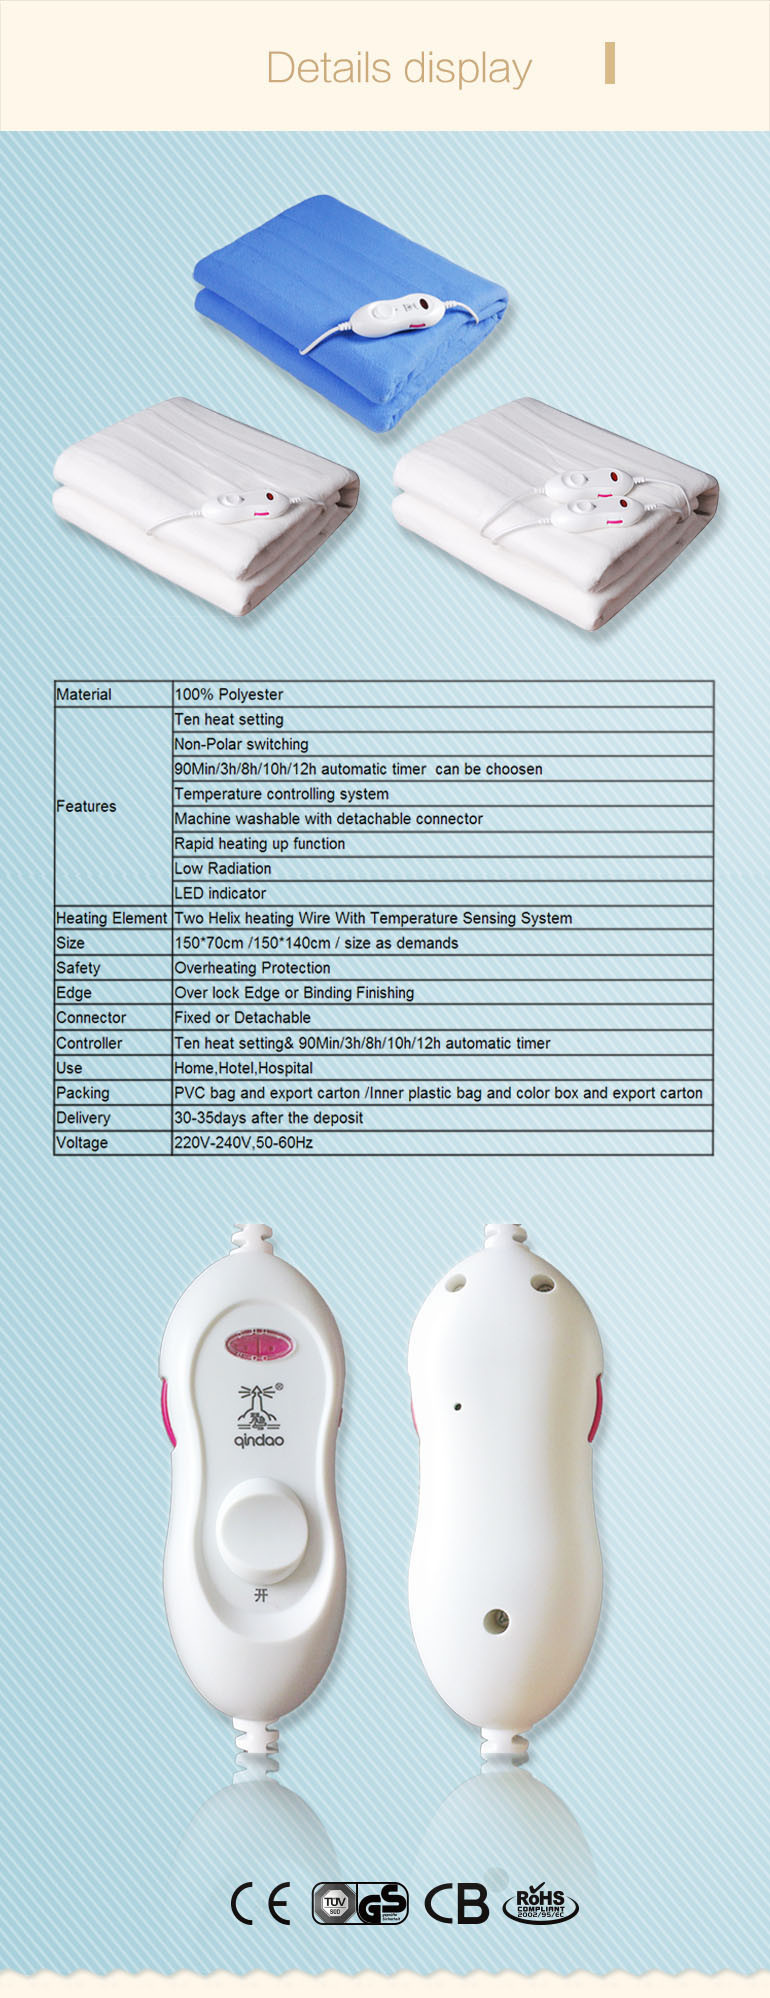 Low Voltage Heat Element Wire Wiring Diagram E2eb 015ha